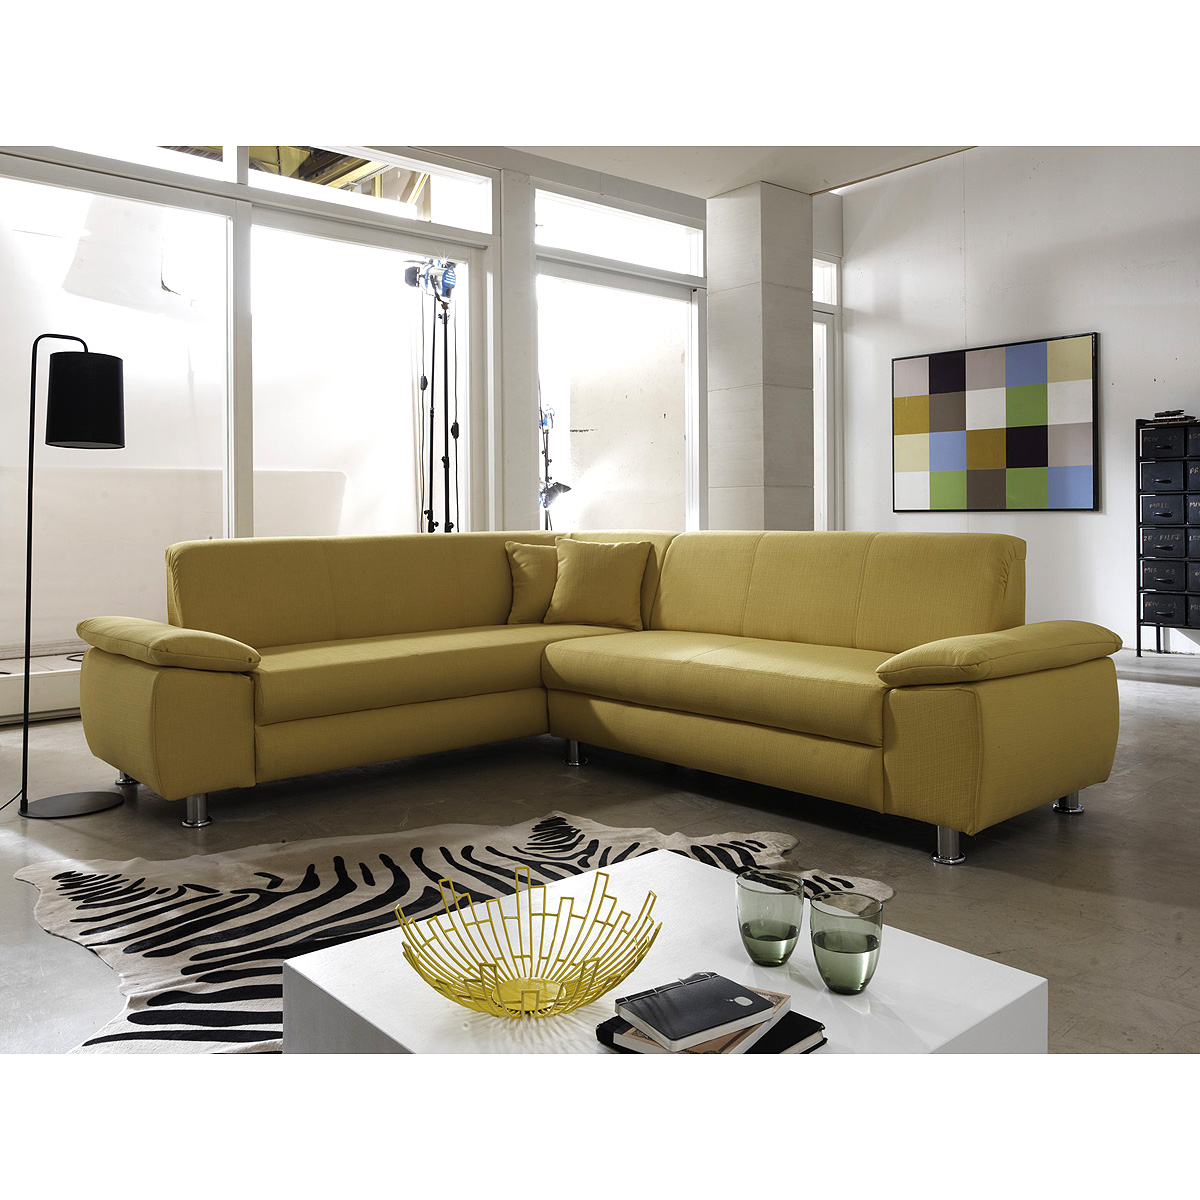 wohnlandschaft mexico ecksofa sofa polsterm bel. Black Bedroom Furniture Sets. Home Design Ideas